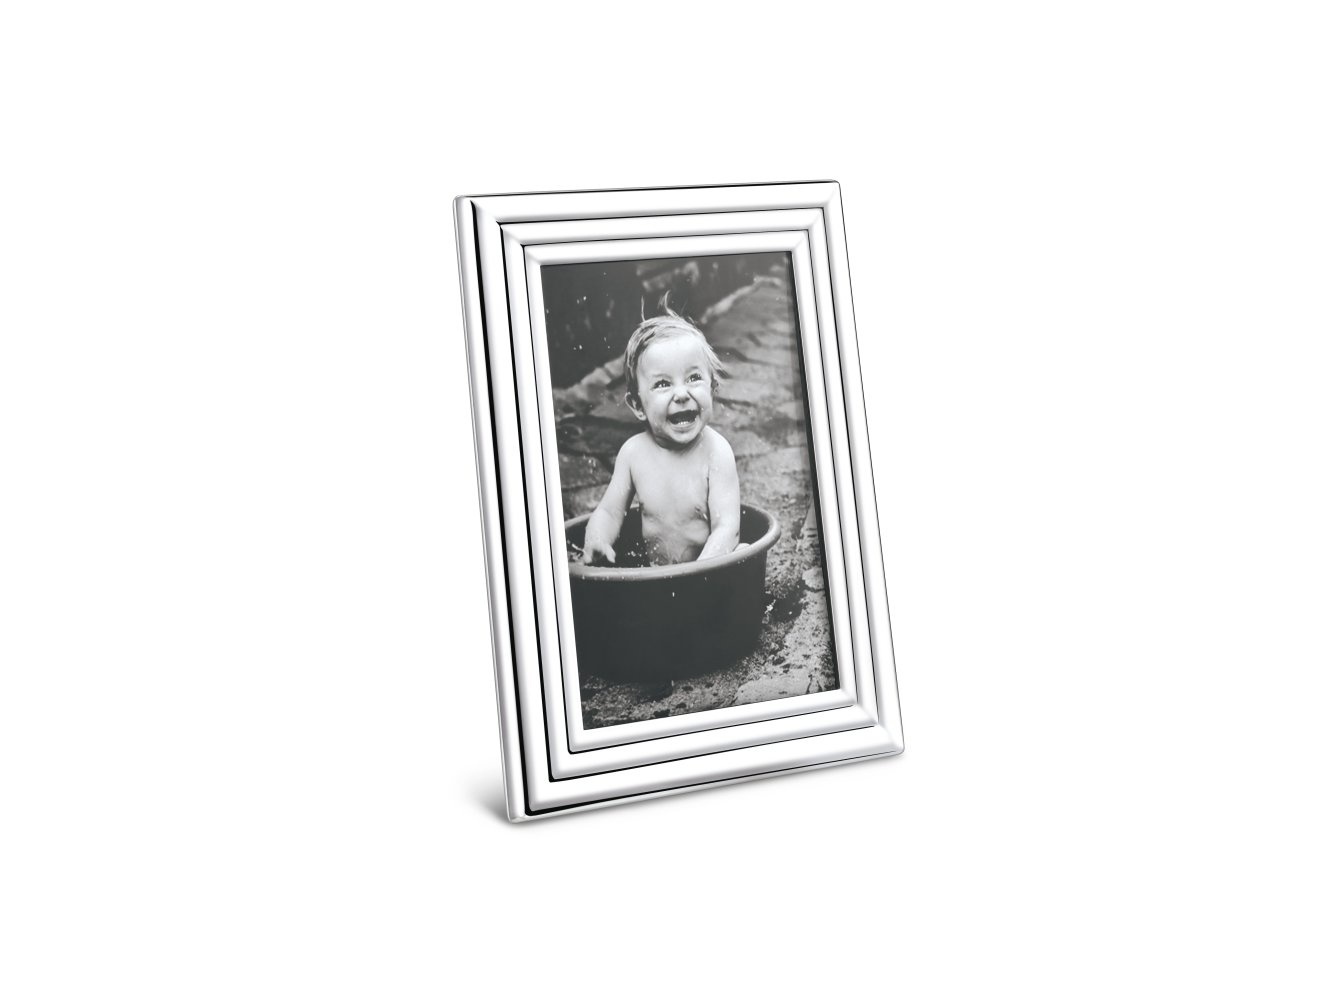 Georg Jensen Picture Legacy Fotolijst 10x15 cm